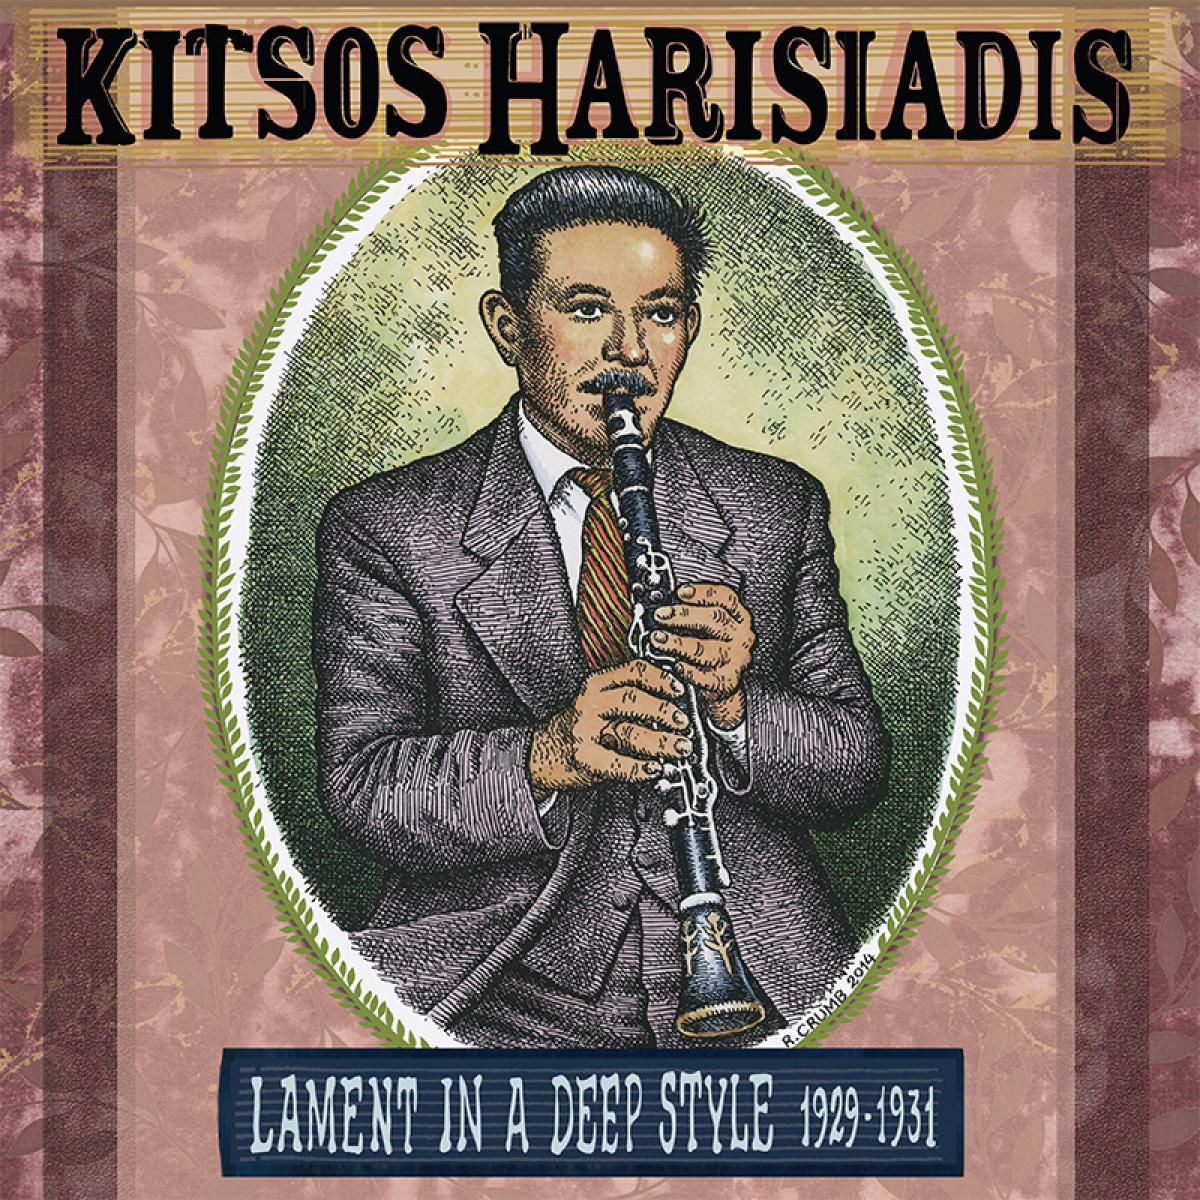 KITSOS HARISIADIS - LAMENT IN A DEEP STYLE 1929-1931